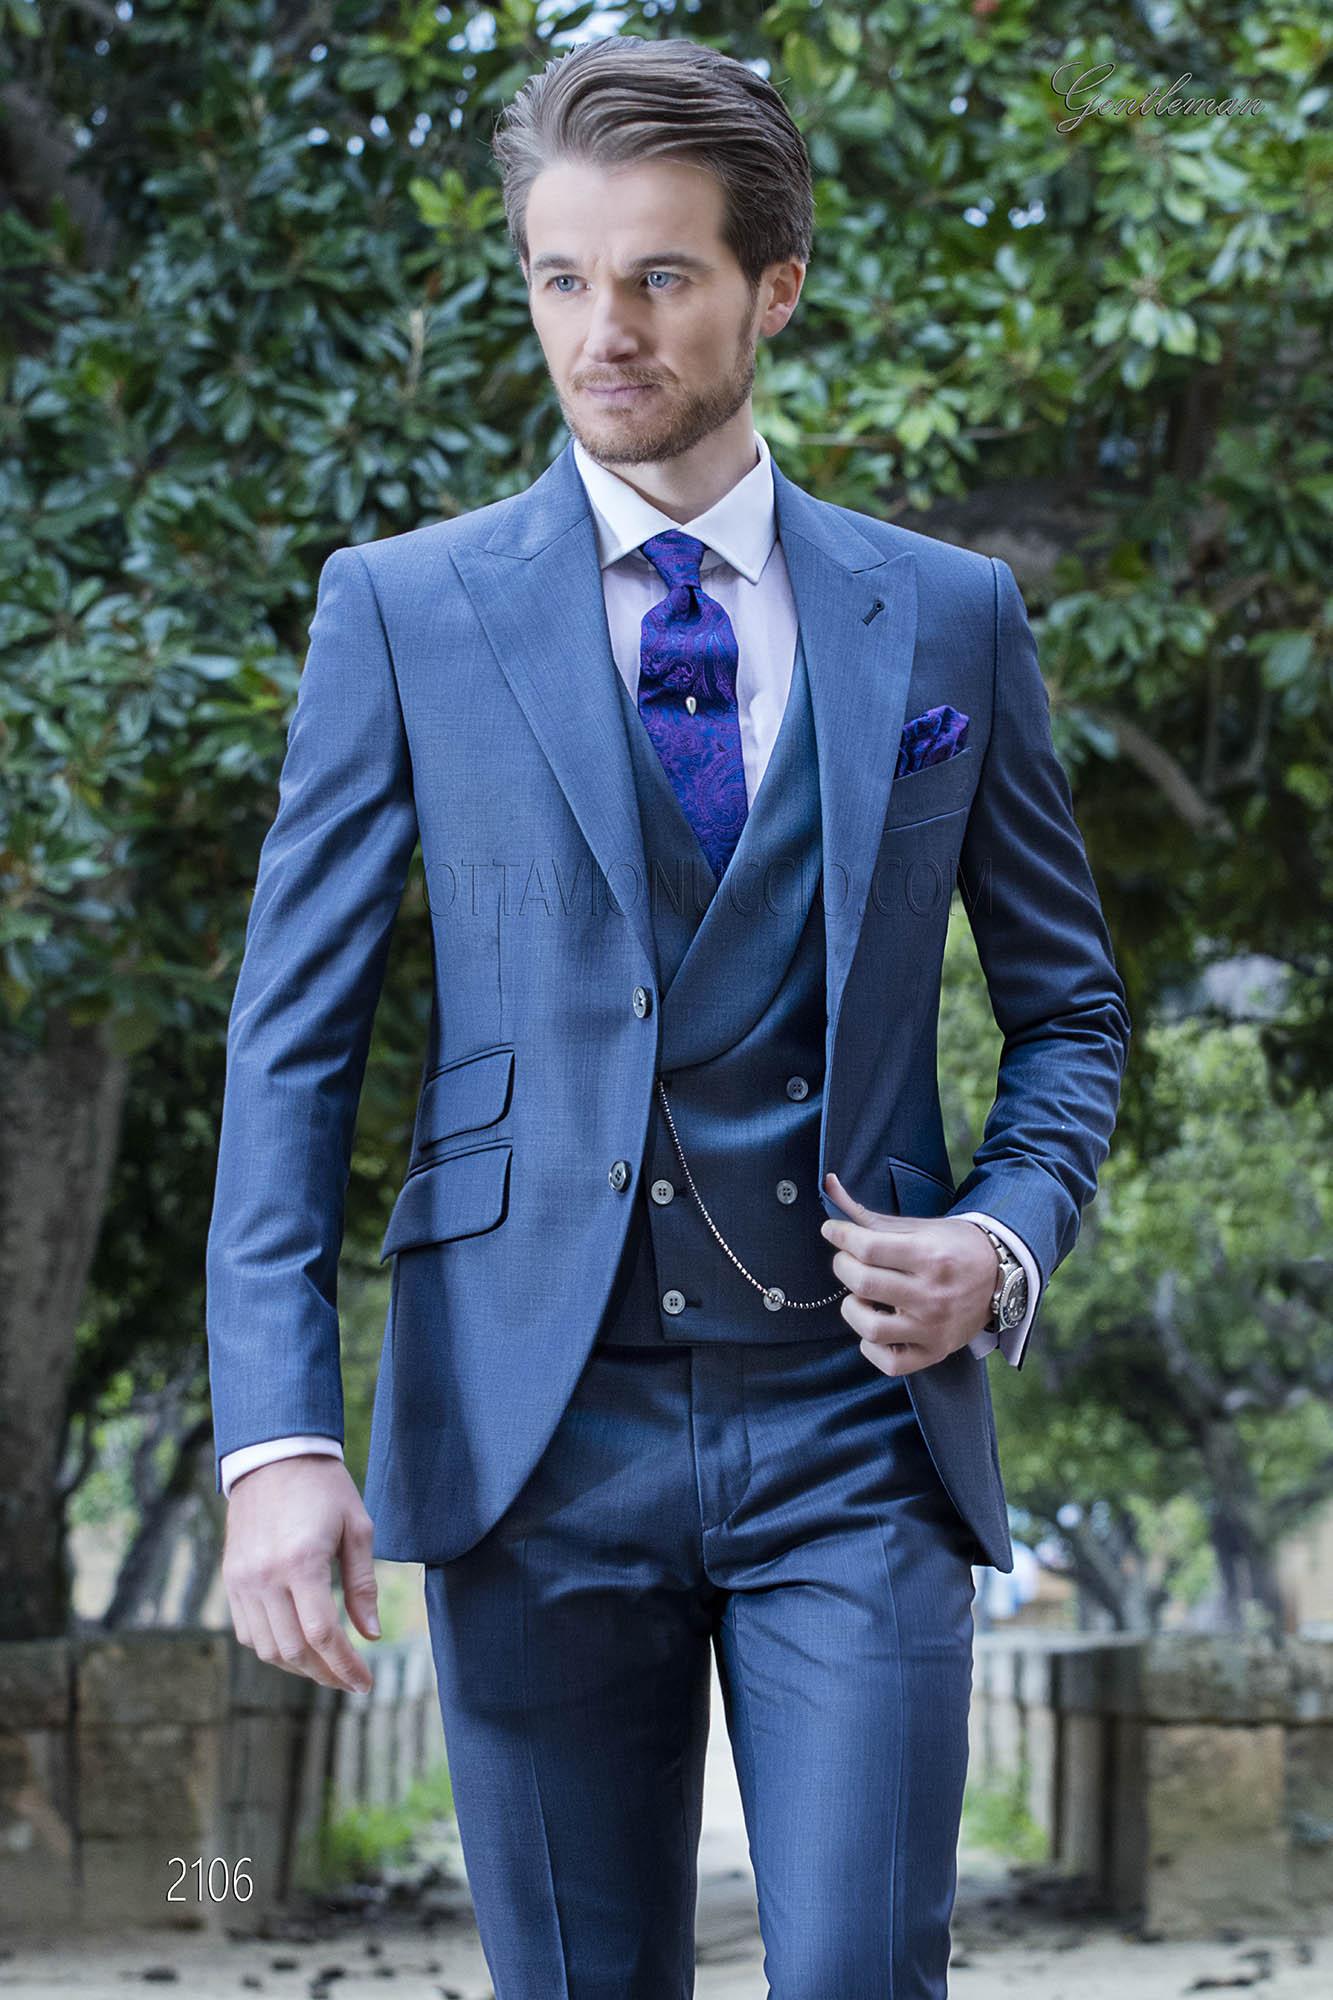 Fancy Italian Wedding Suits For Men Crest - Wedding Plan Ideas ...